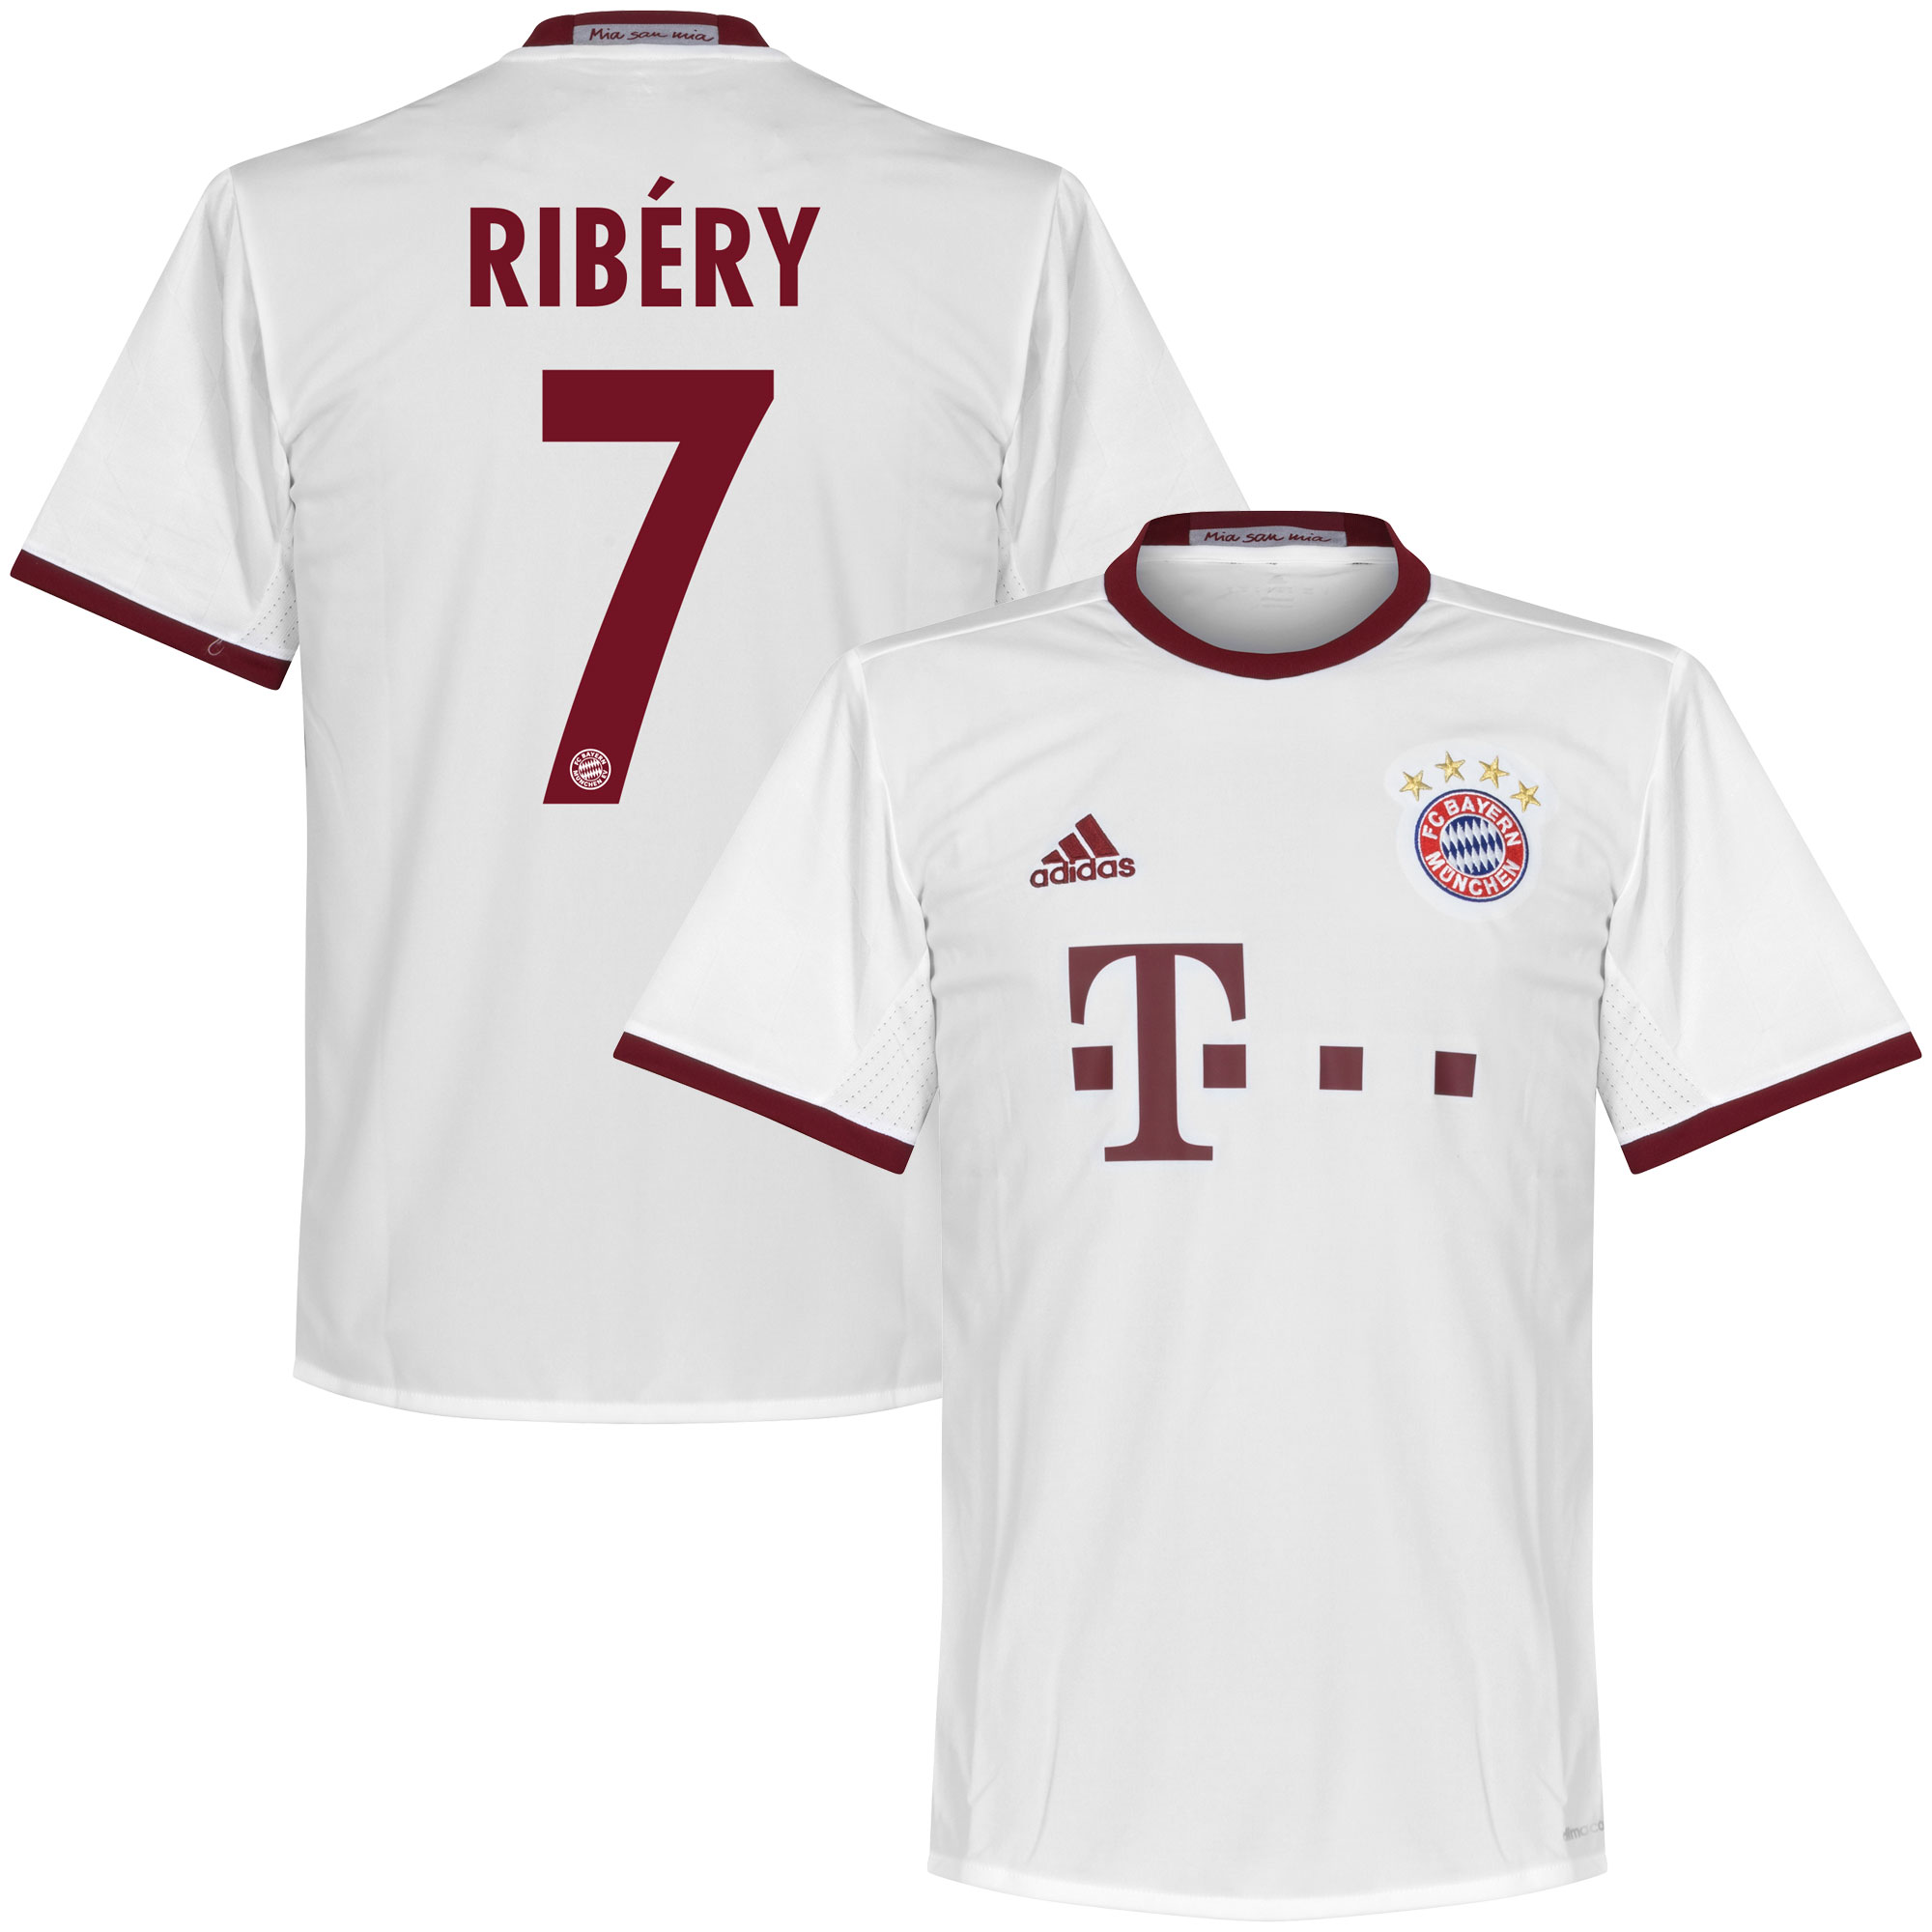 Bayern Munich 3rd Ribéry Jersey 2016 / 2017 (Official Printing) - 66